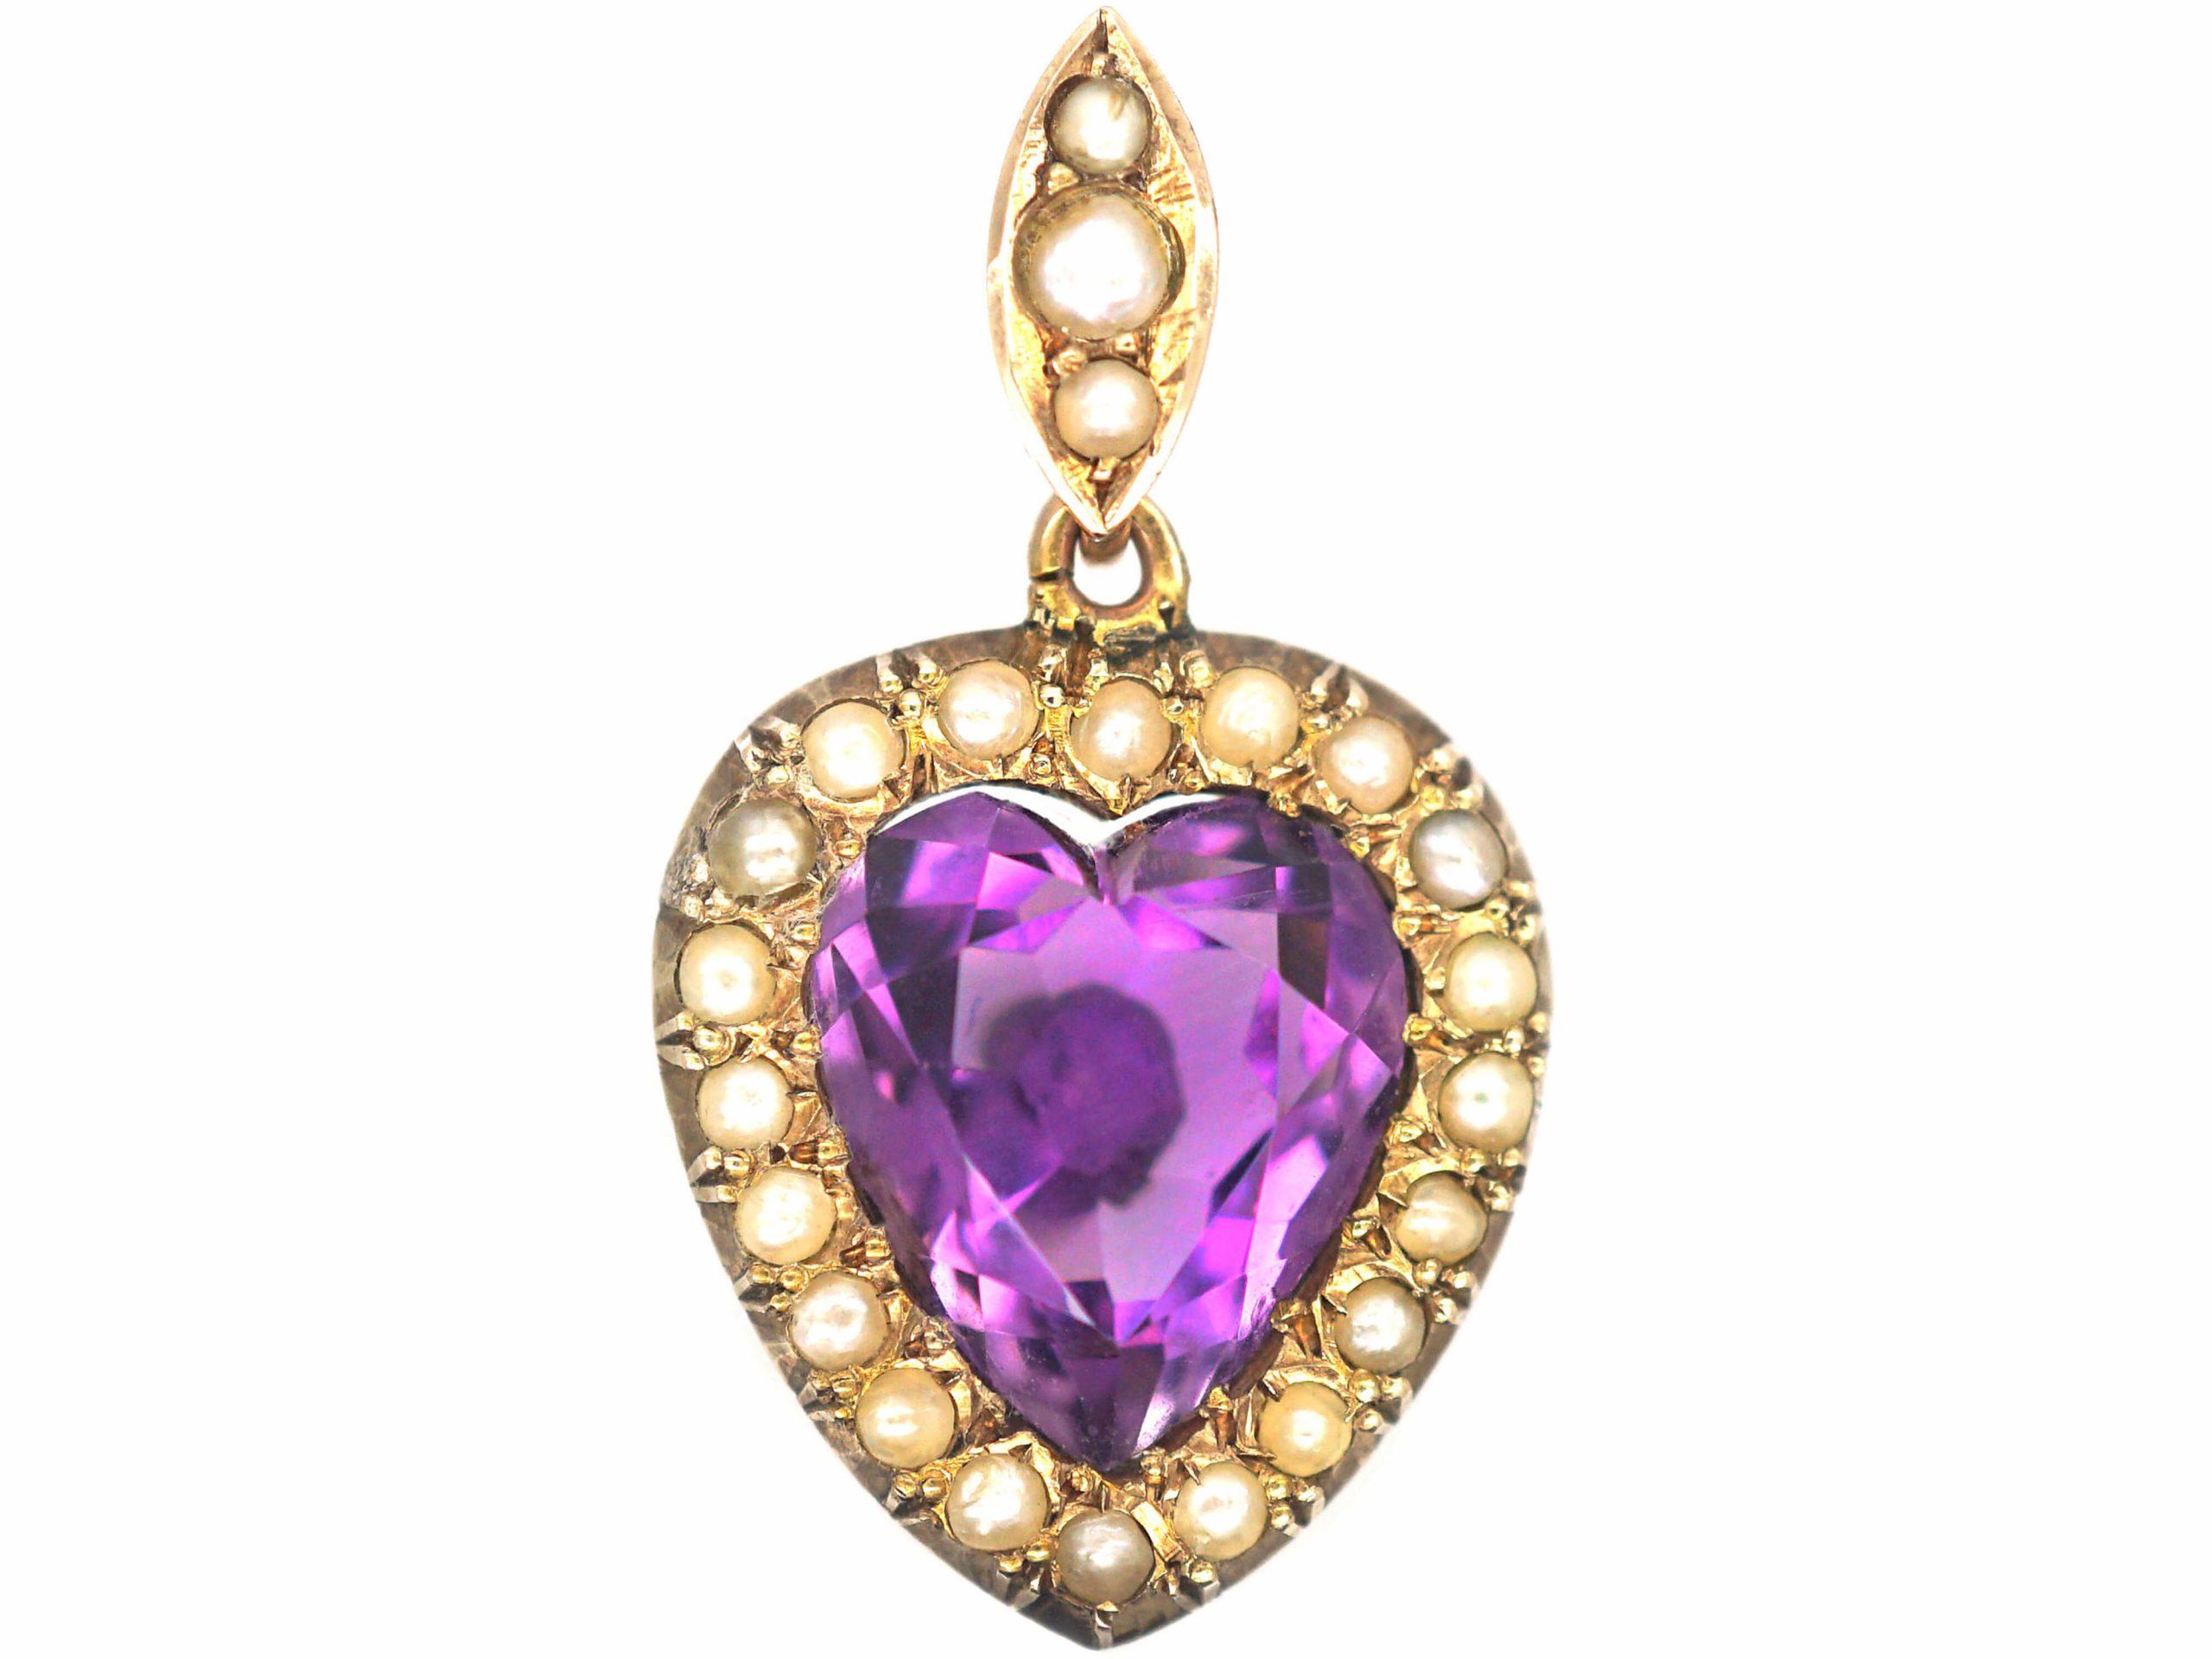 Edwardian 9ct Gold, Amethyst & Natural Split Pearl Heart Shaped Pendant